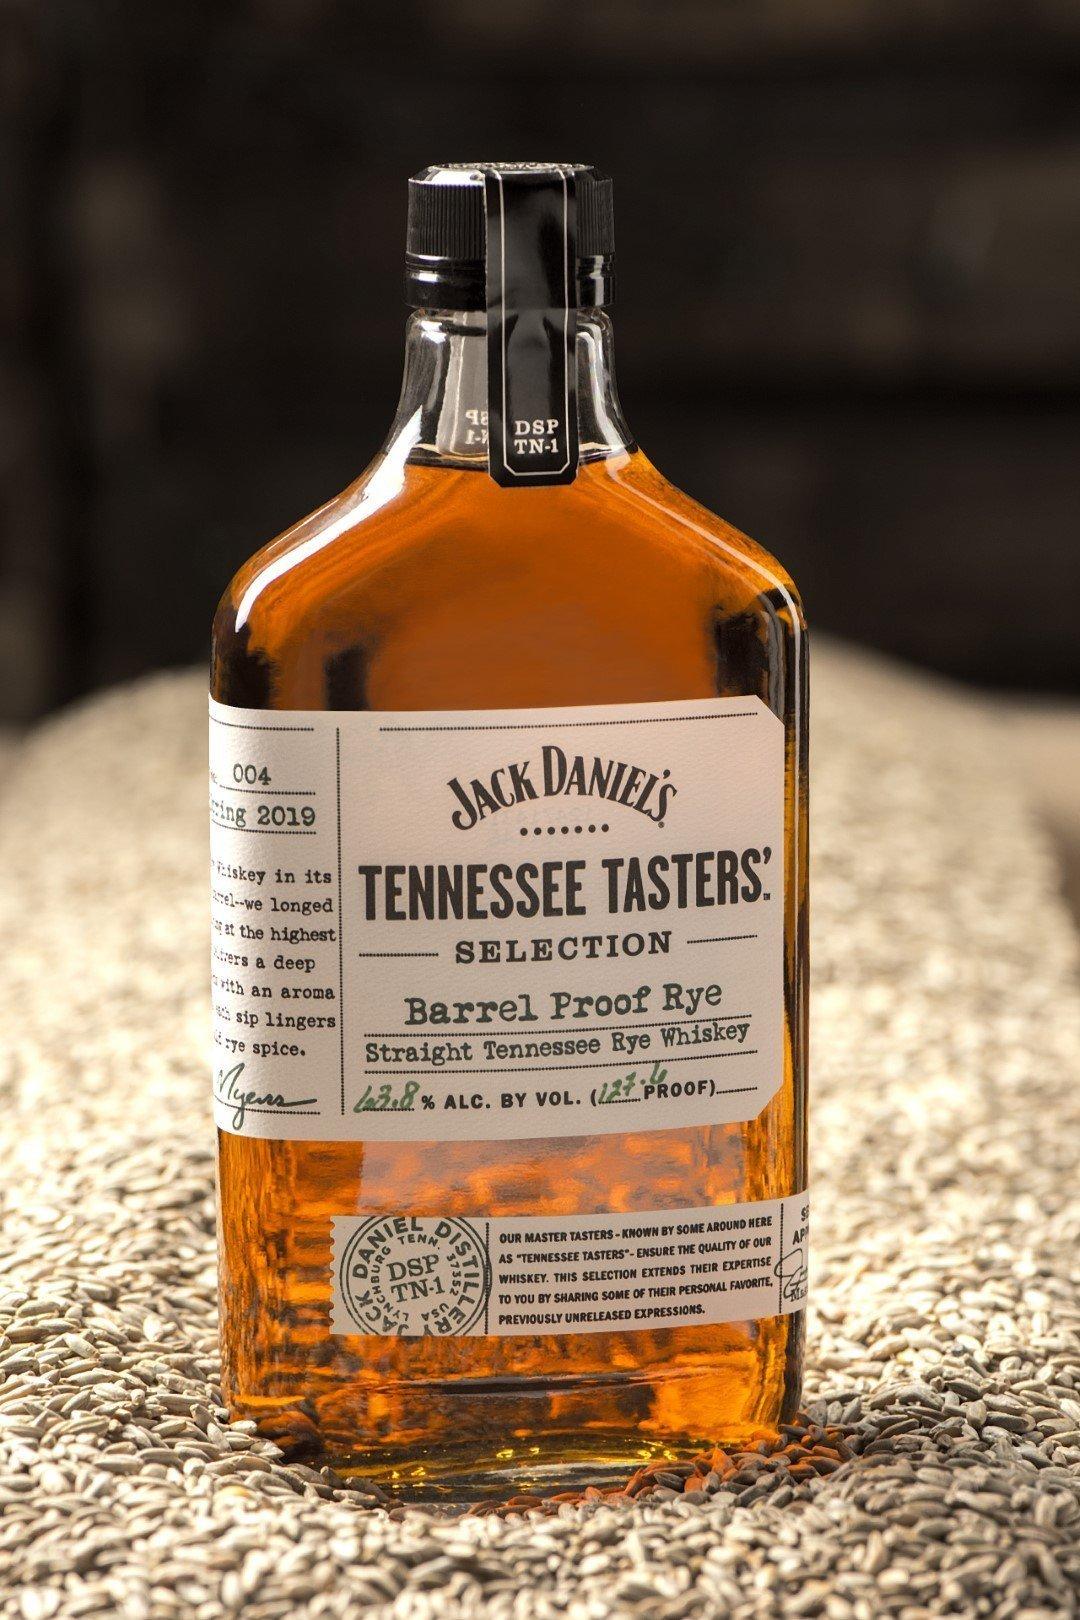 Jack Daniel's Tennessee Tasters' Selections – Barrel Proof Rye